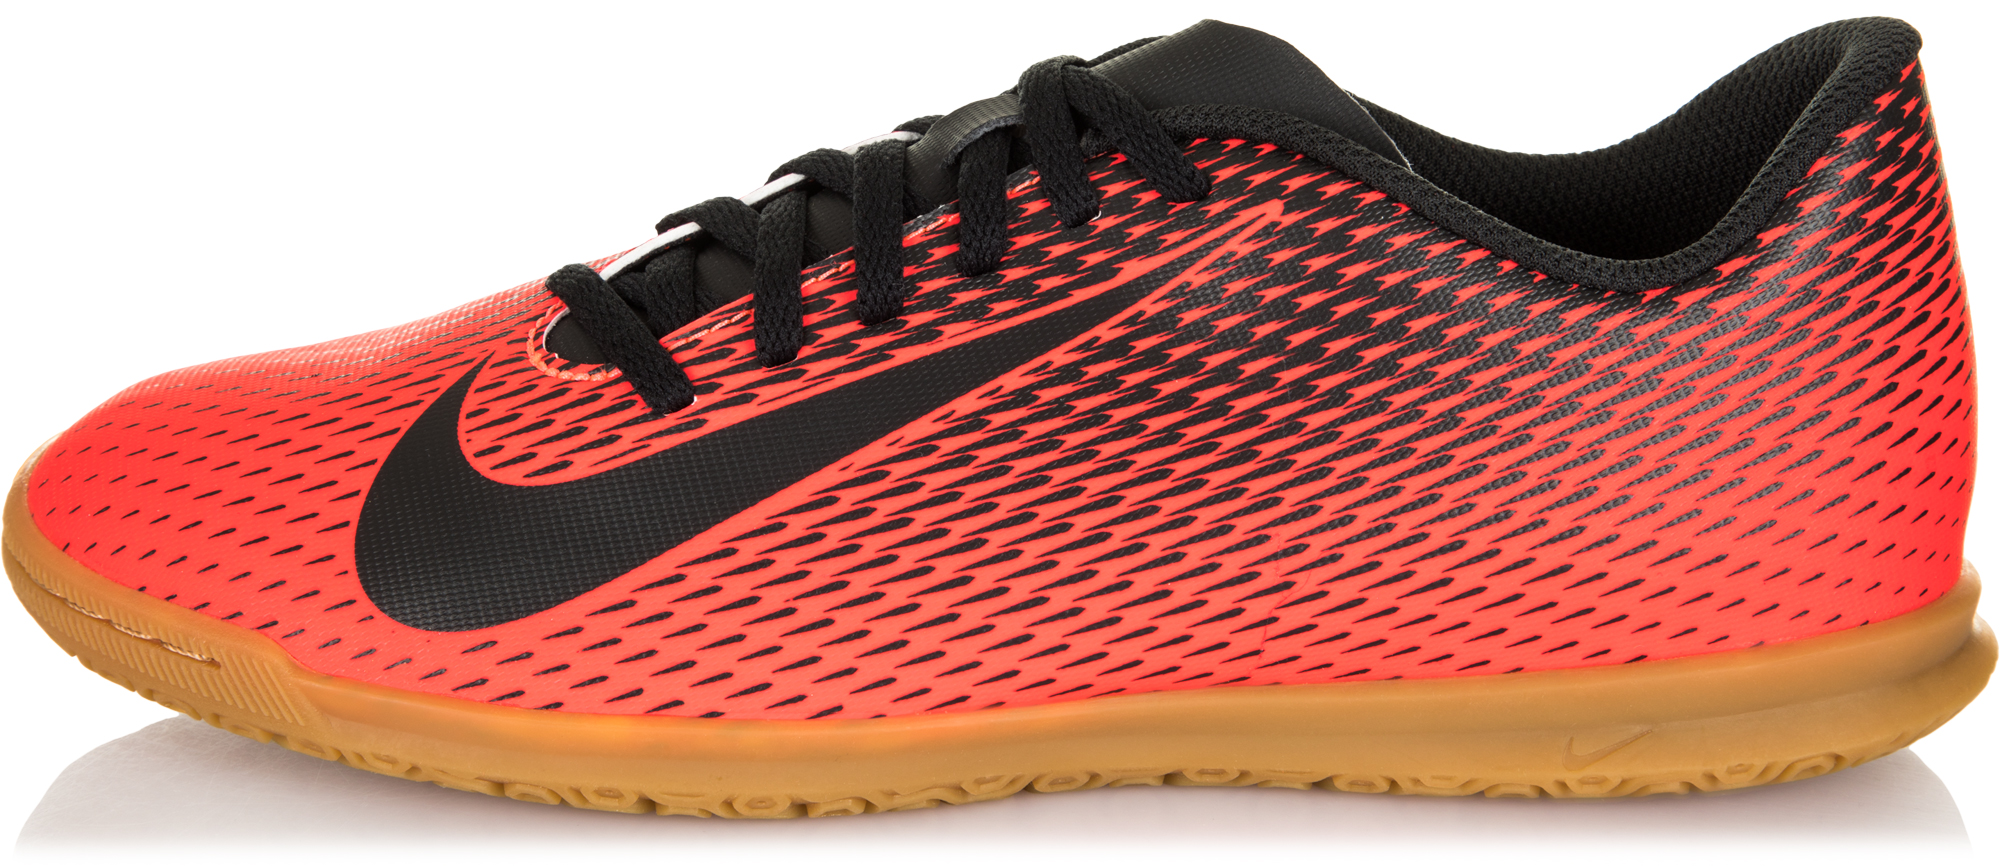 Nike Бутсы мужские Nike Bravatax II IC, размер 44,5